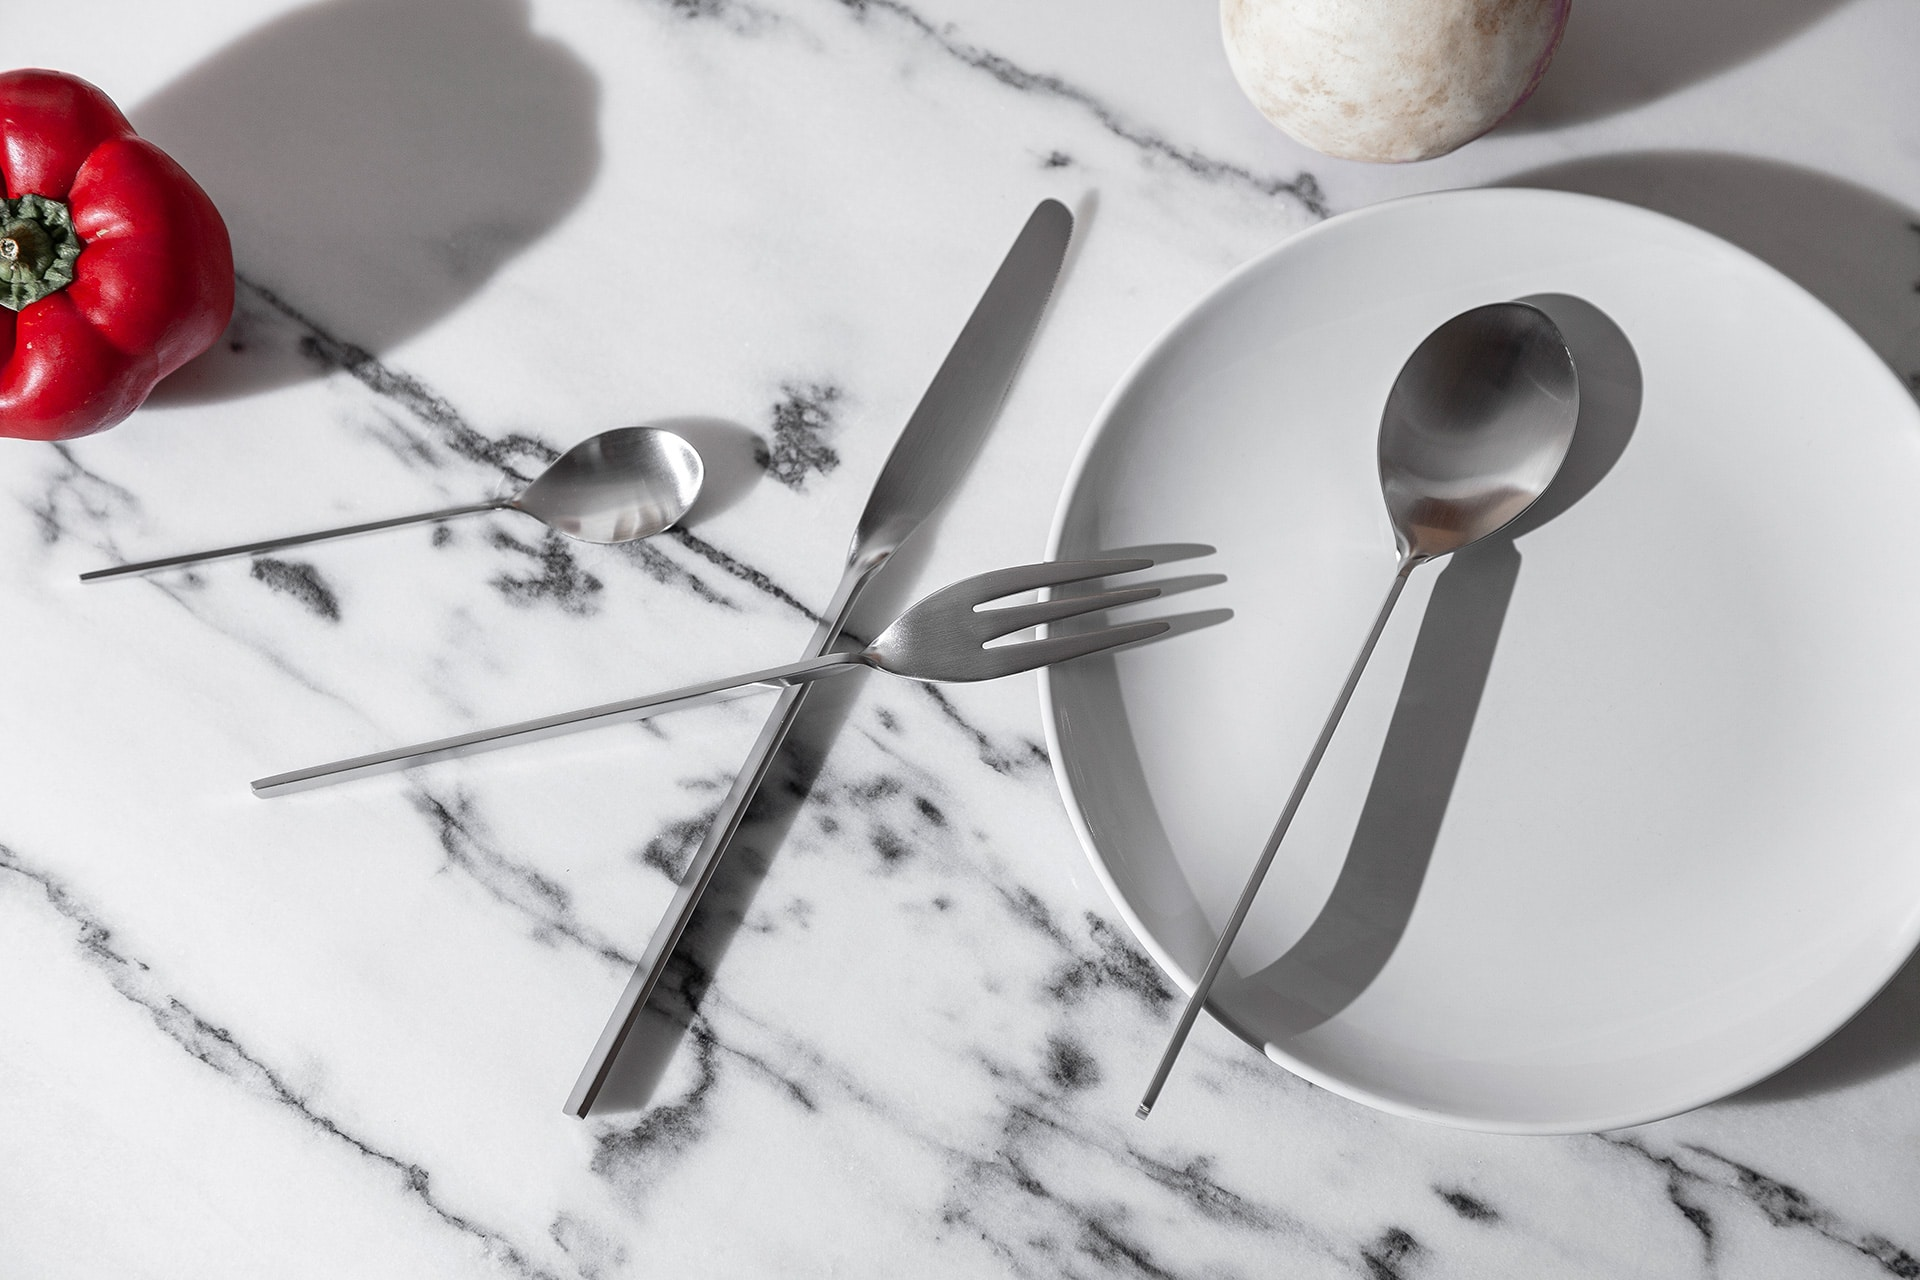 Malmo_Cutlery_White Spoon